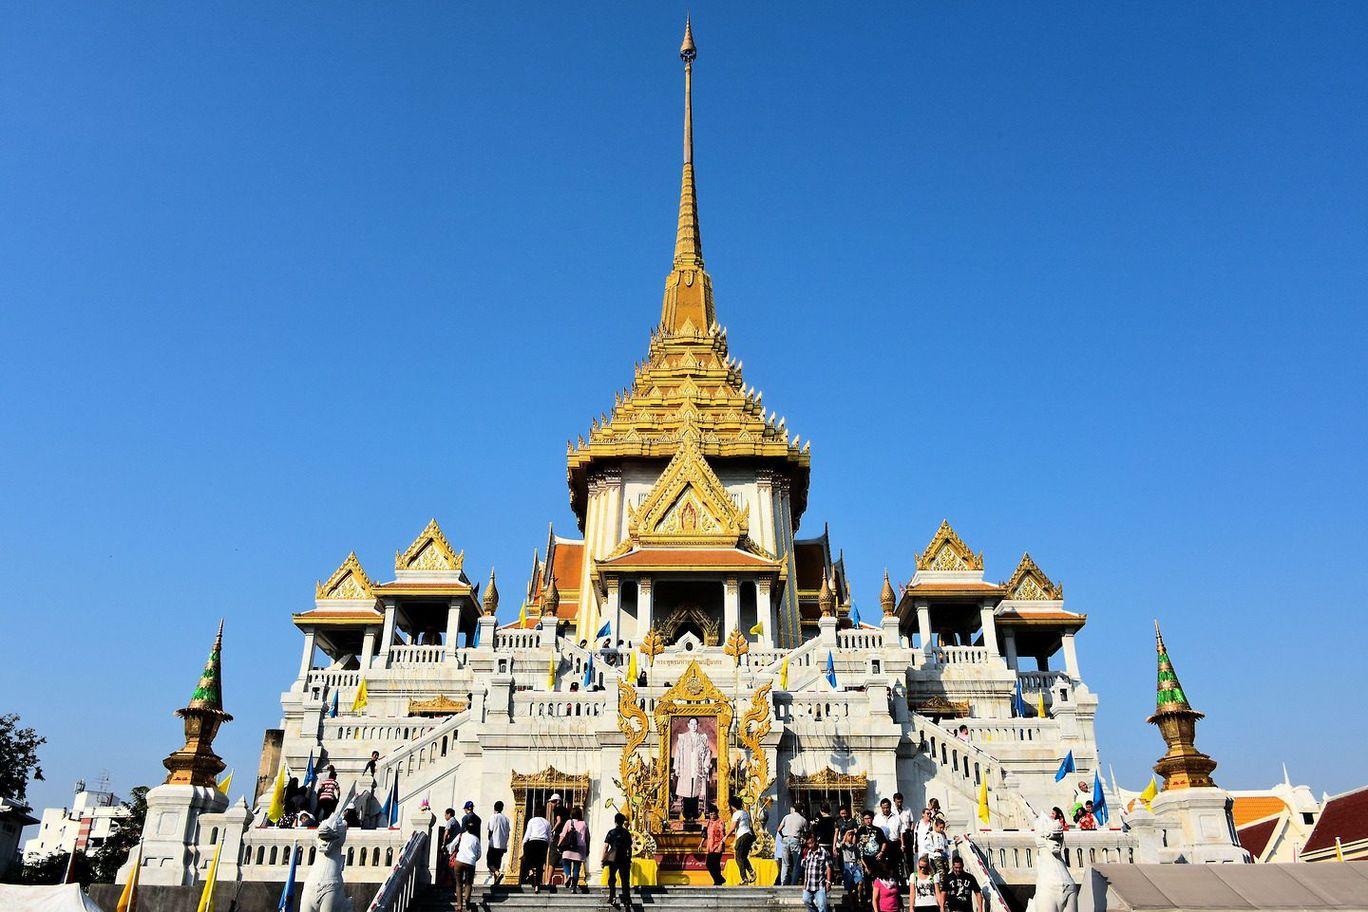 Photo of Wat Traimitr Withayaram Worawihan By Ankush Goyal